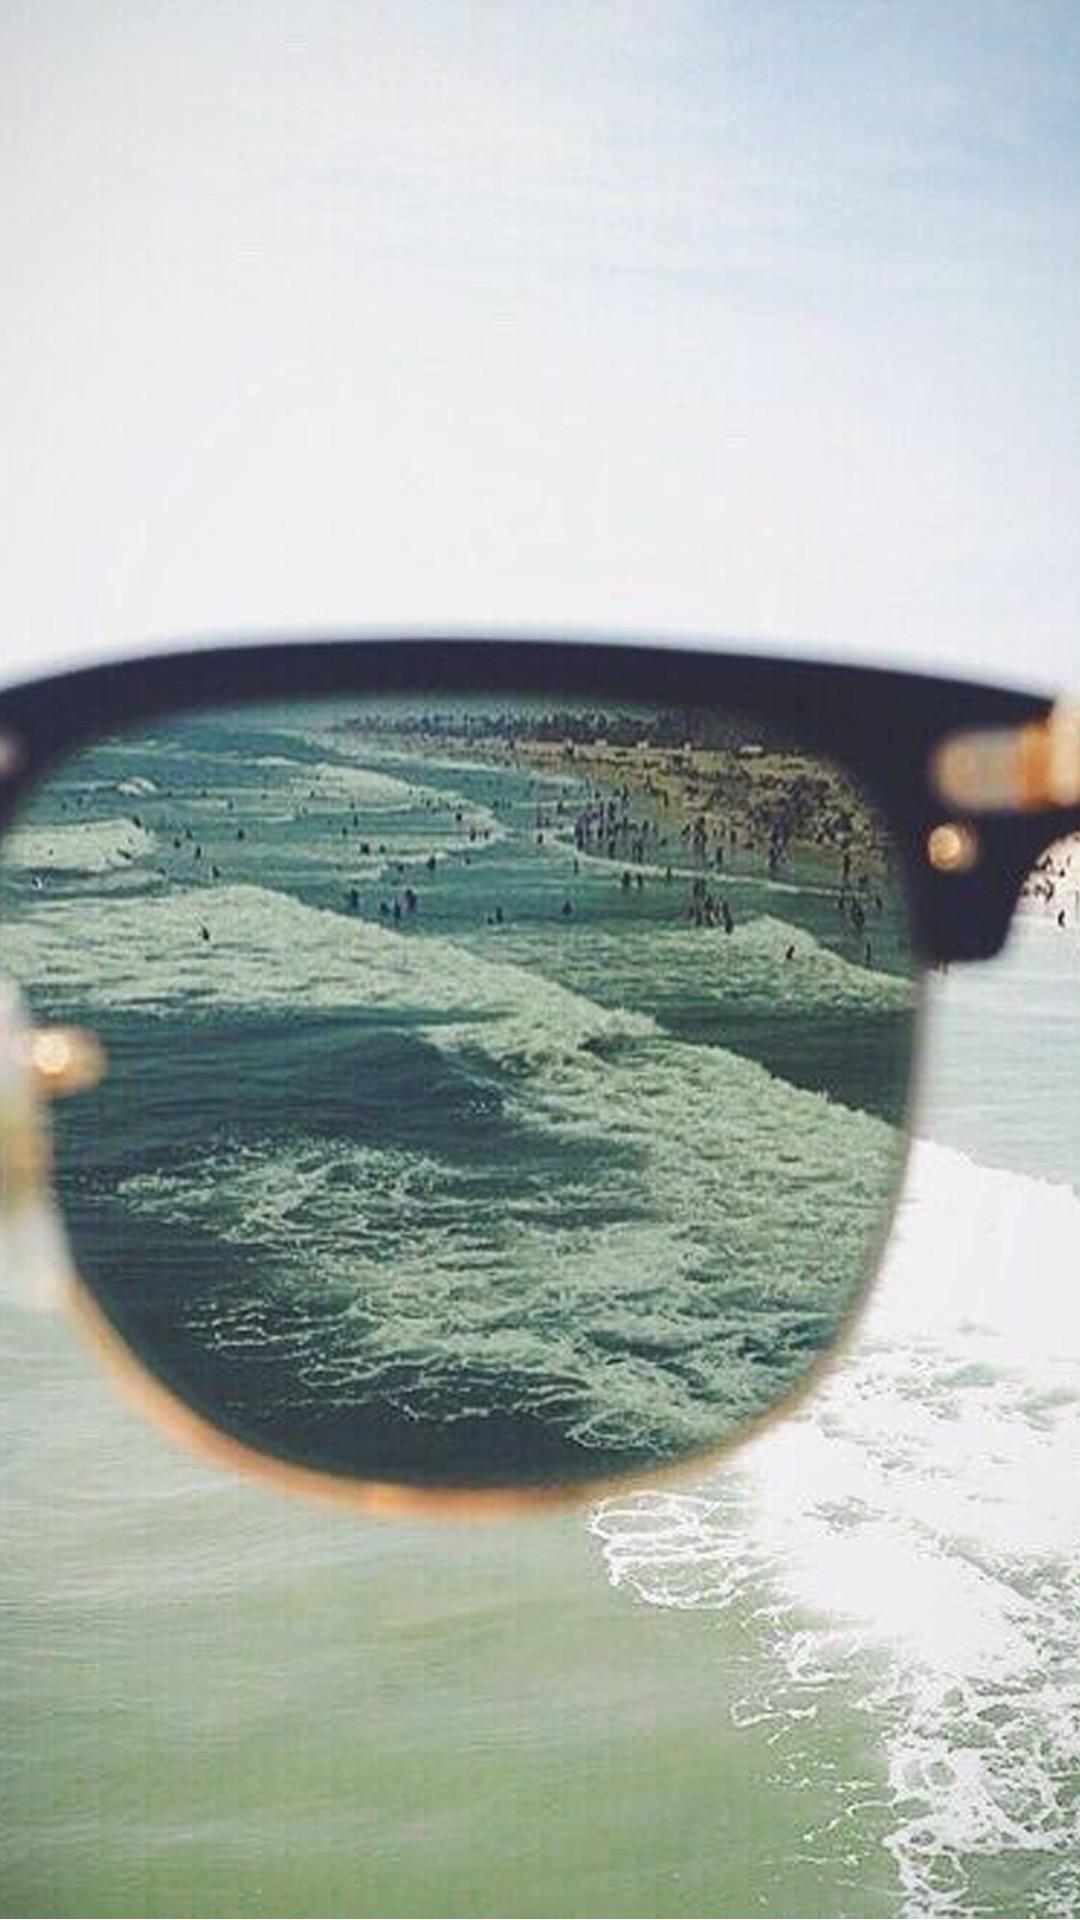 Summer Day whatsapp wallpaper iphone 6S